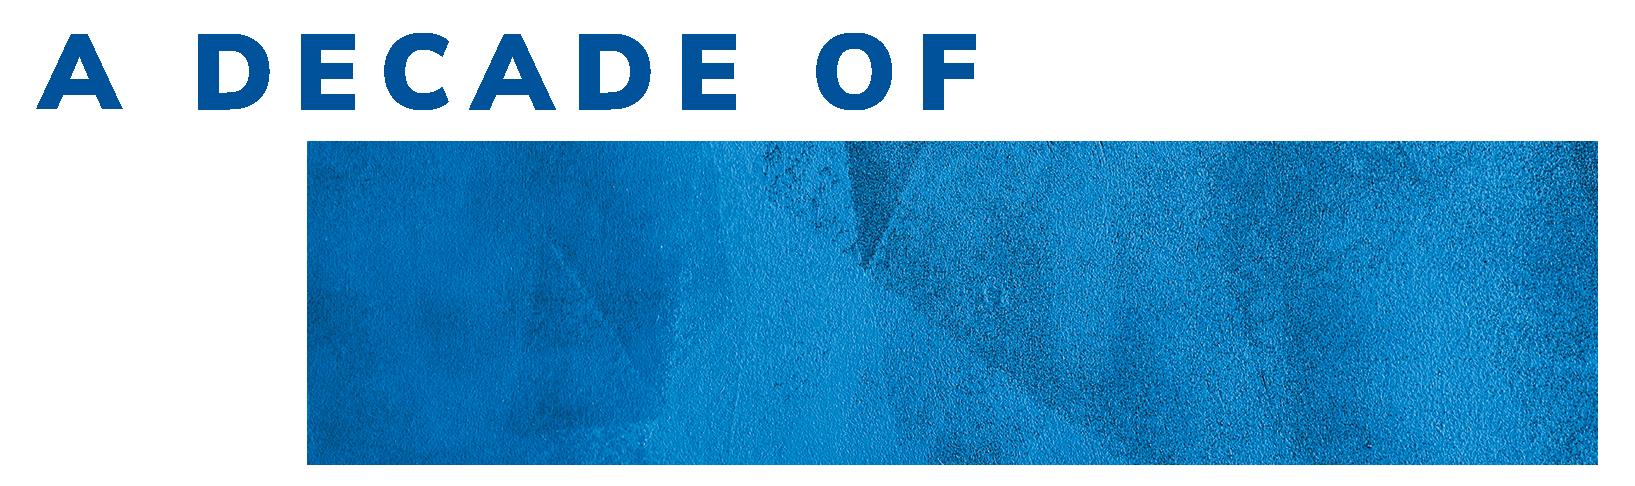 A Decade of Impact